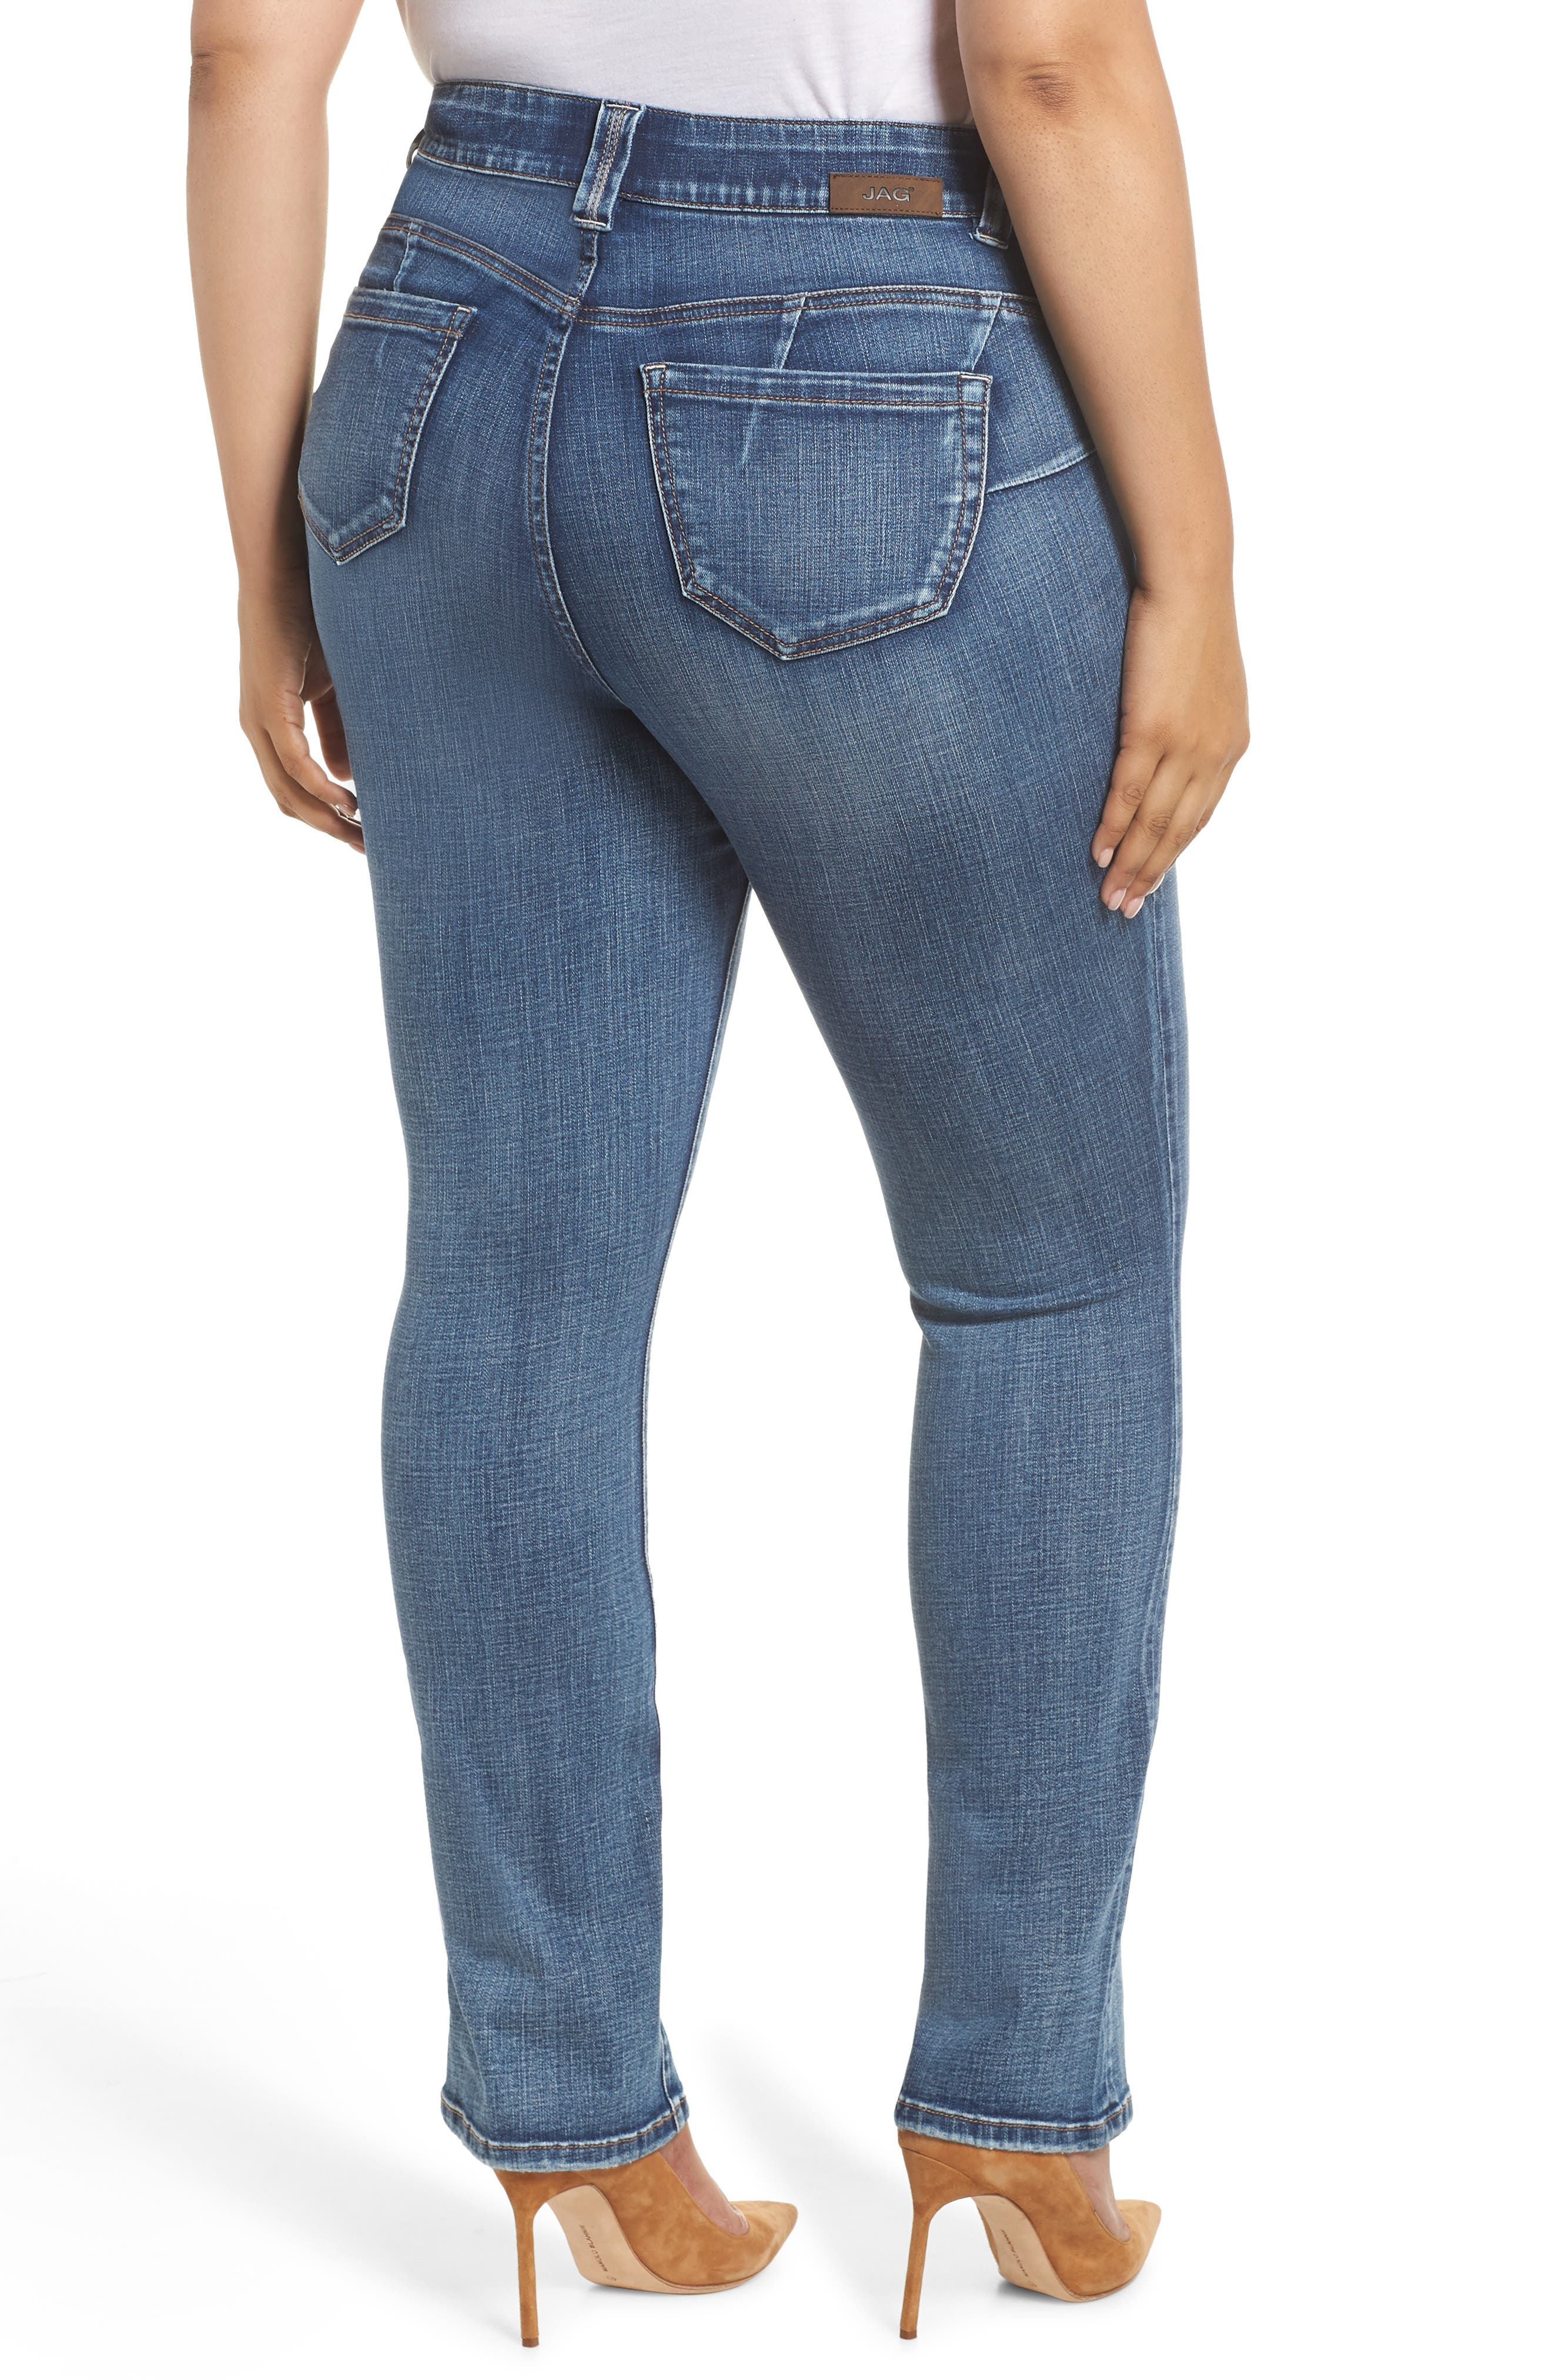 JAG JEANS, Eloise Bootcut Stretch Jeans, Alternate thumbnail 2, color, MED INDIGO